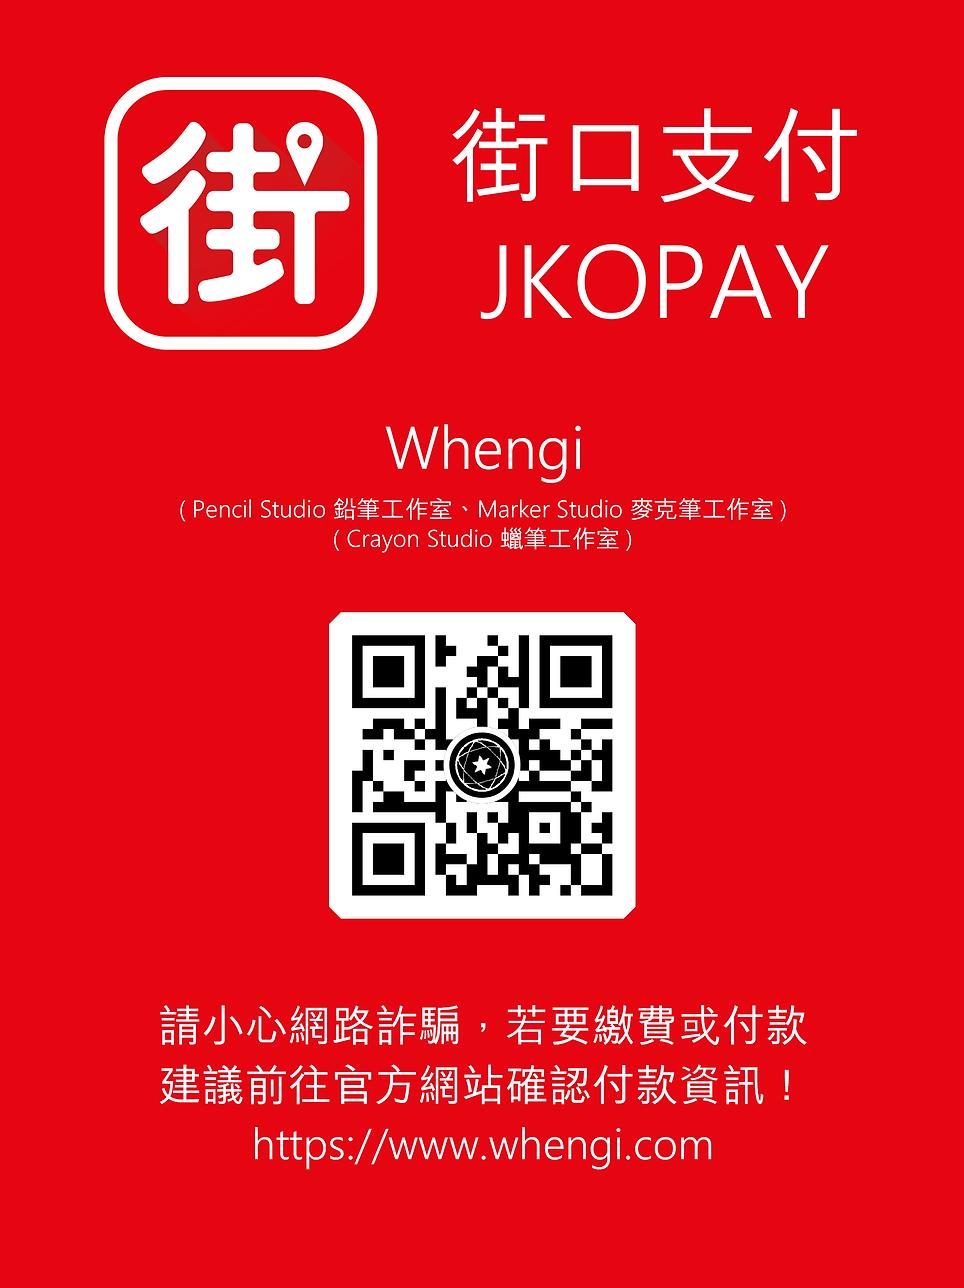 PaymentPoster_JKOPAY.png